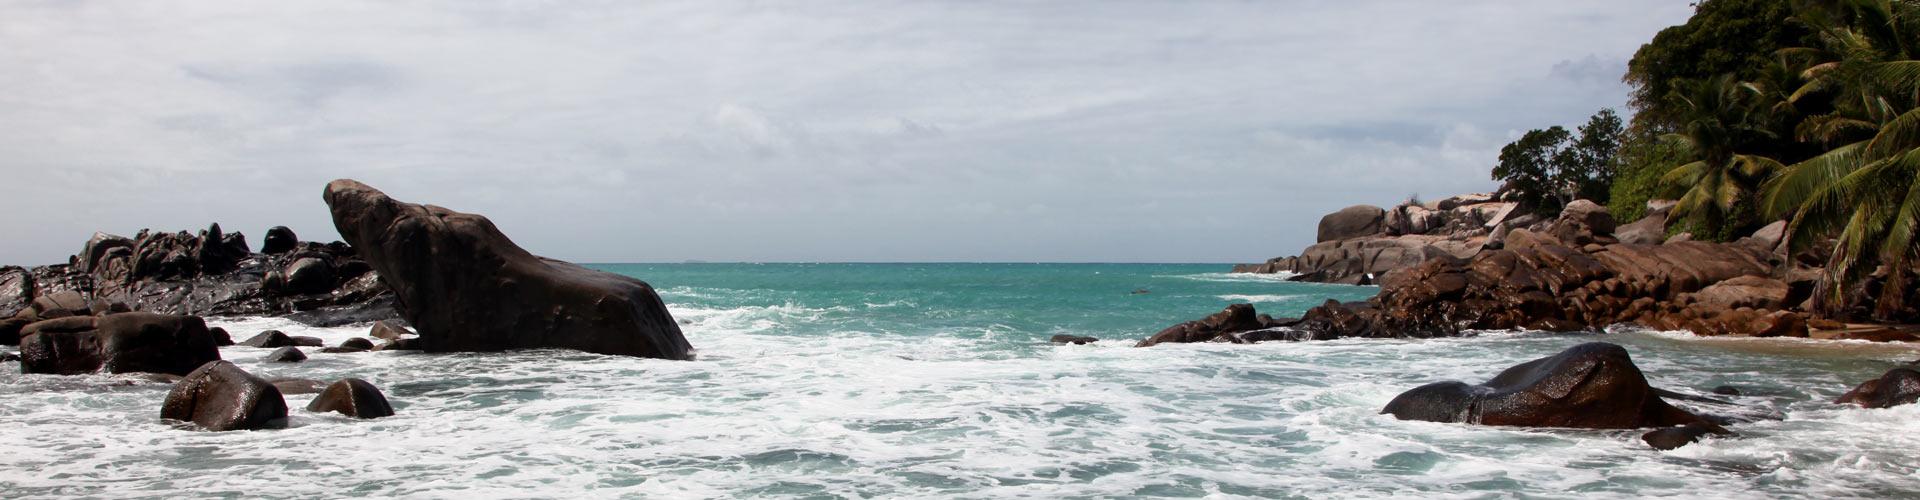 destination seychelles mahe island